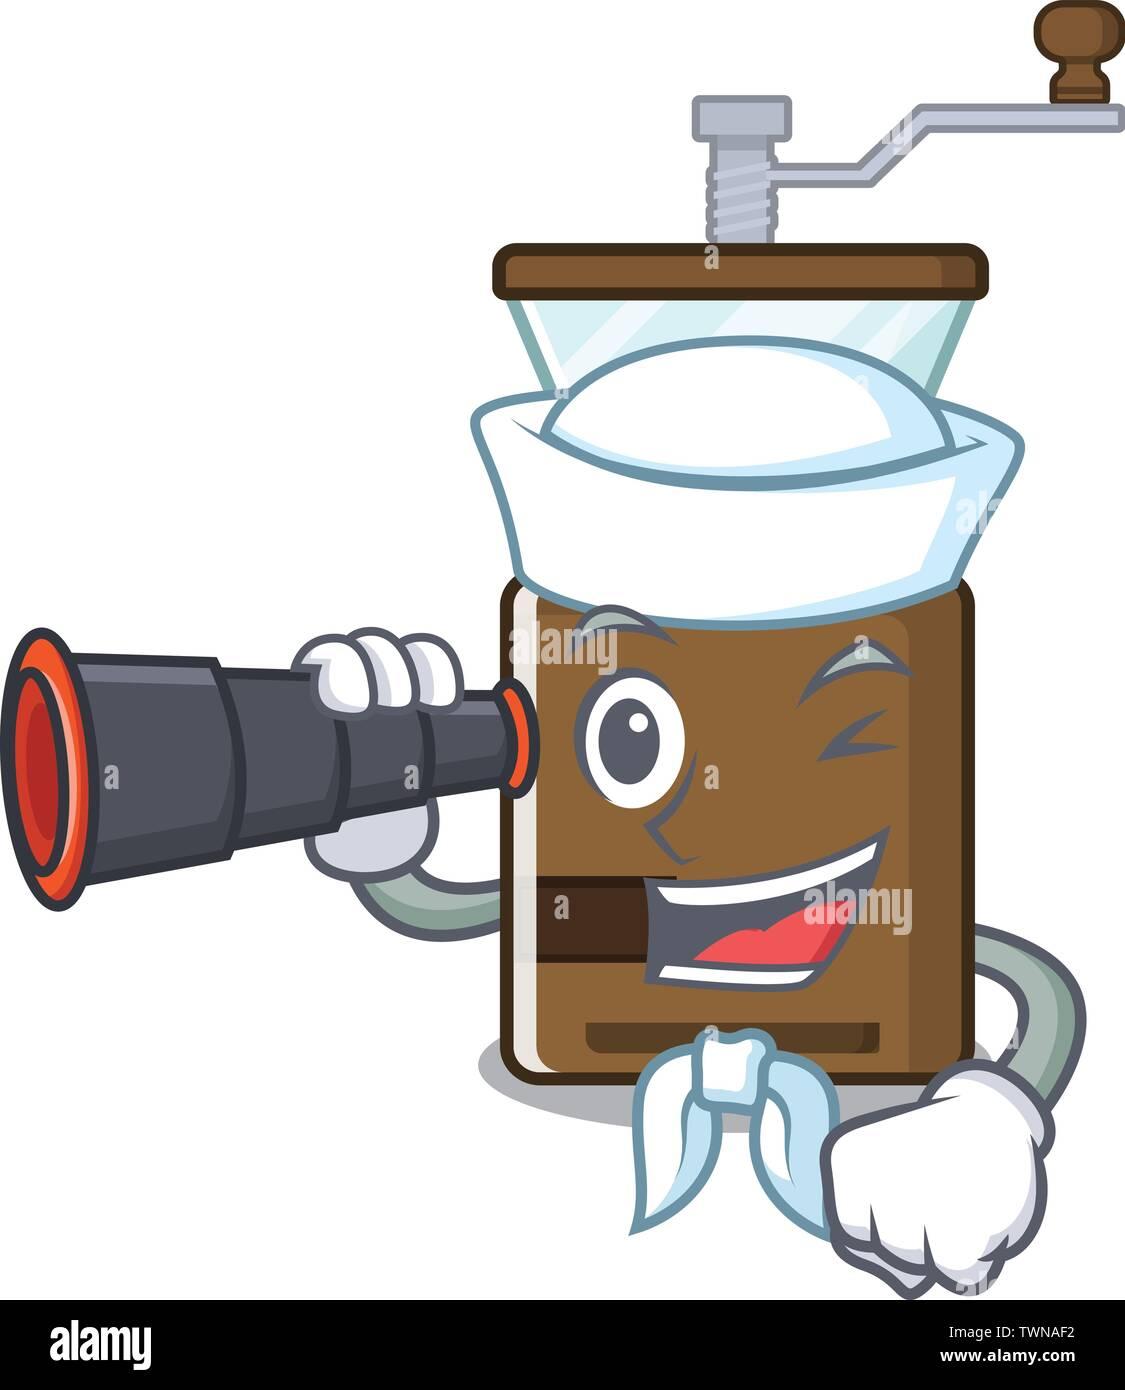 Sailor with binocular cartoon coffee grinder above wooden table - Stock Image